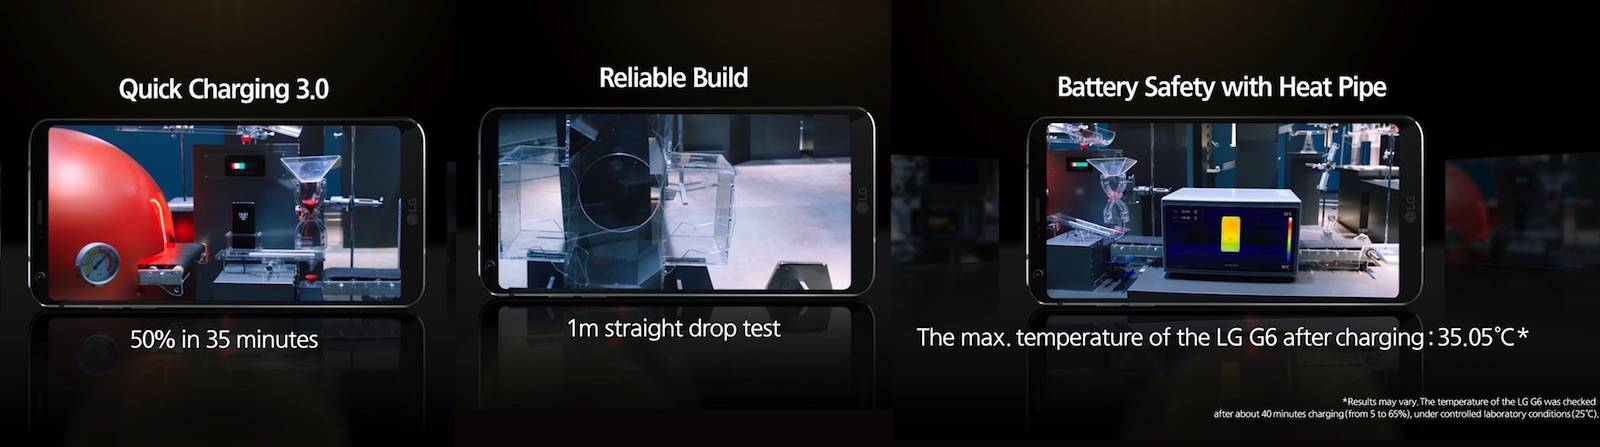 LG G6 passes through a Rube Goldberg machine in a fun demo video